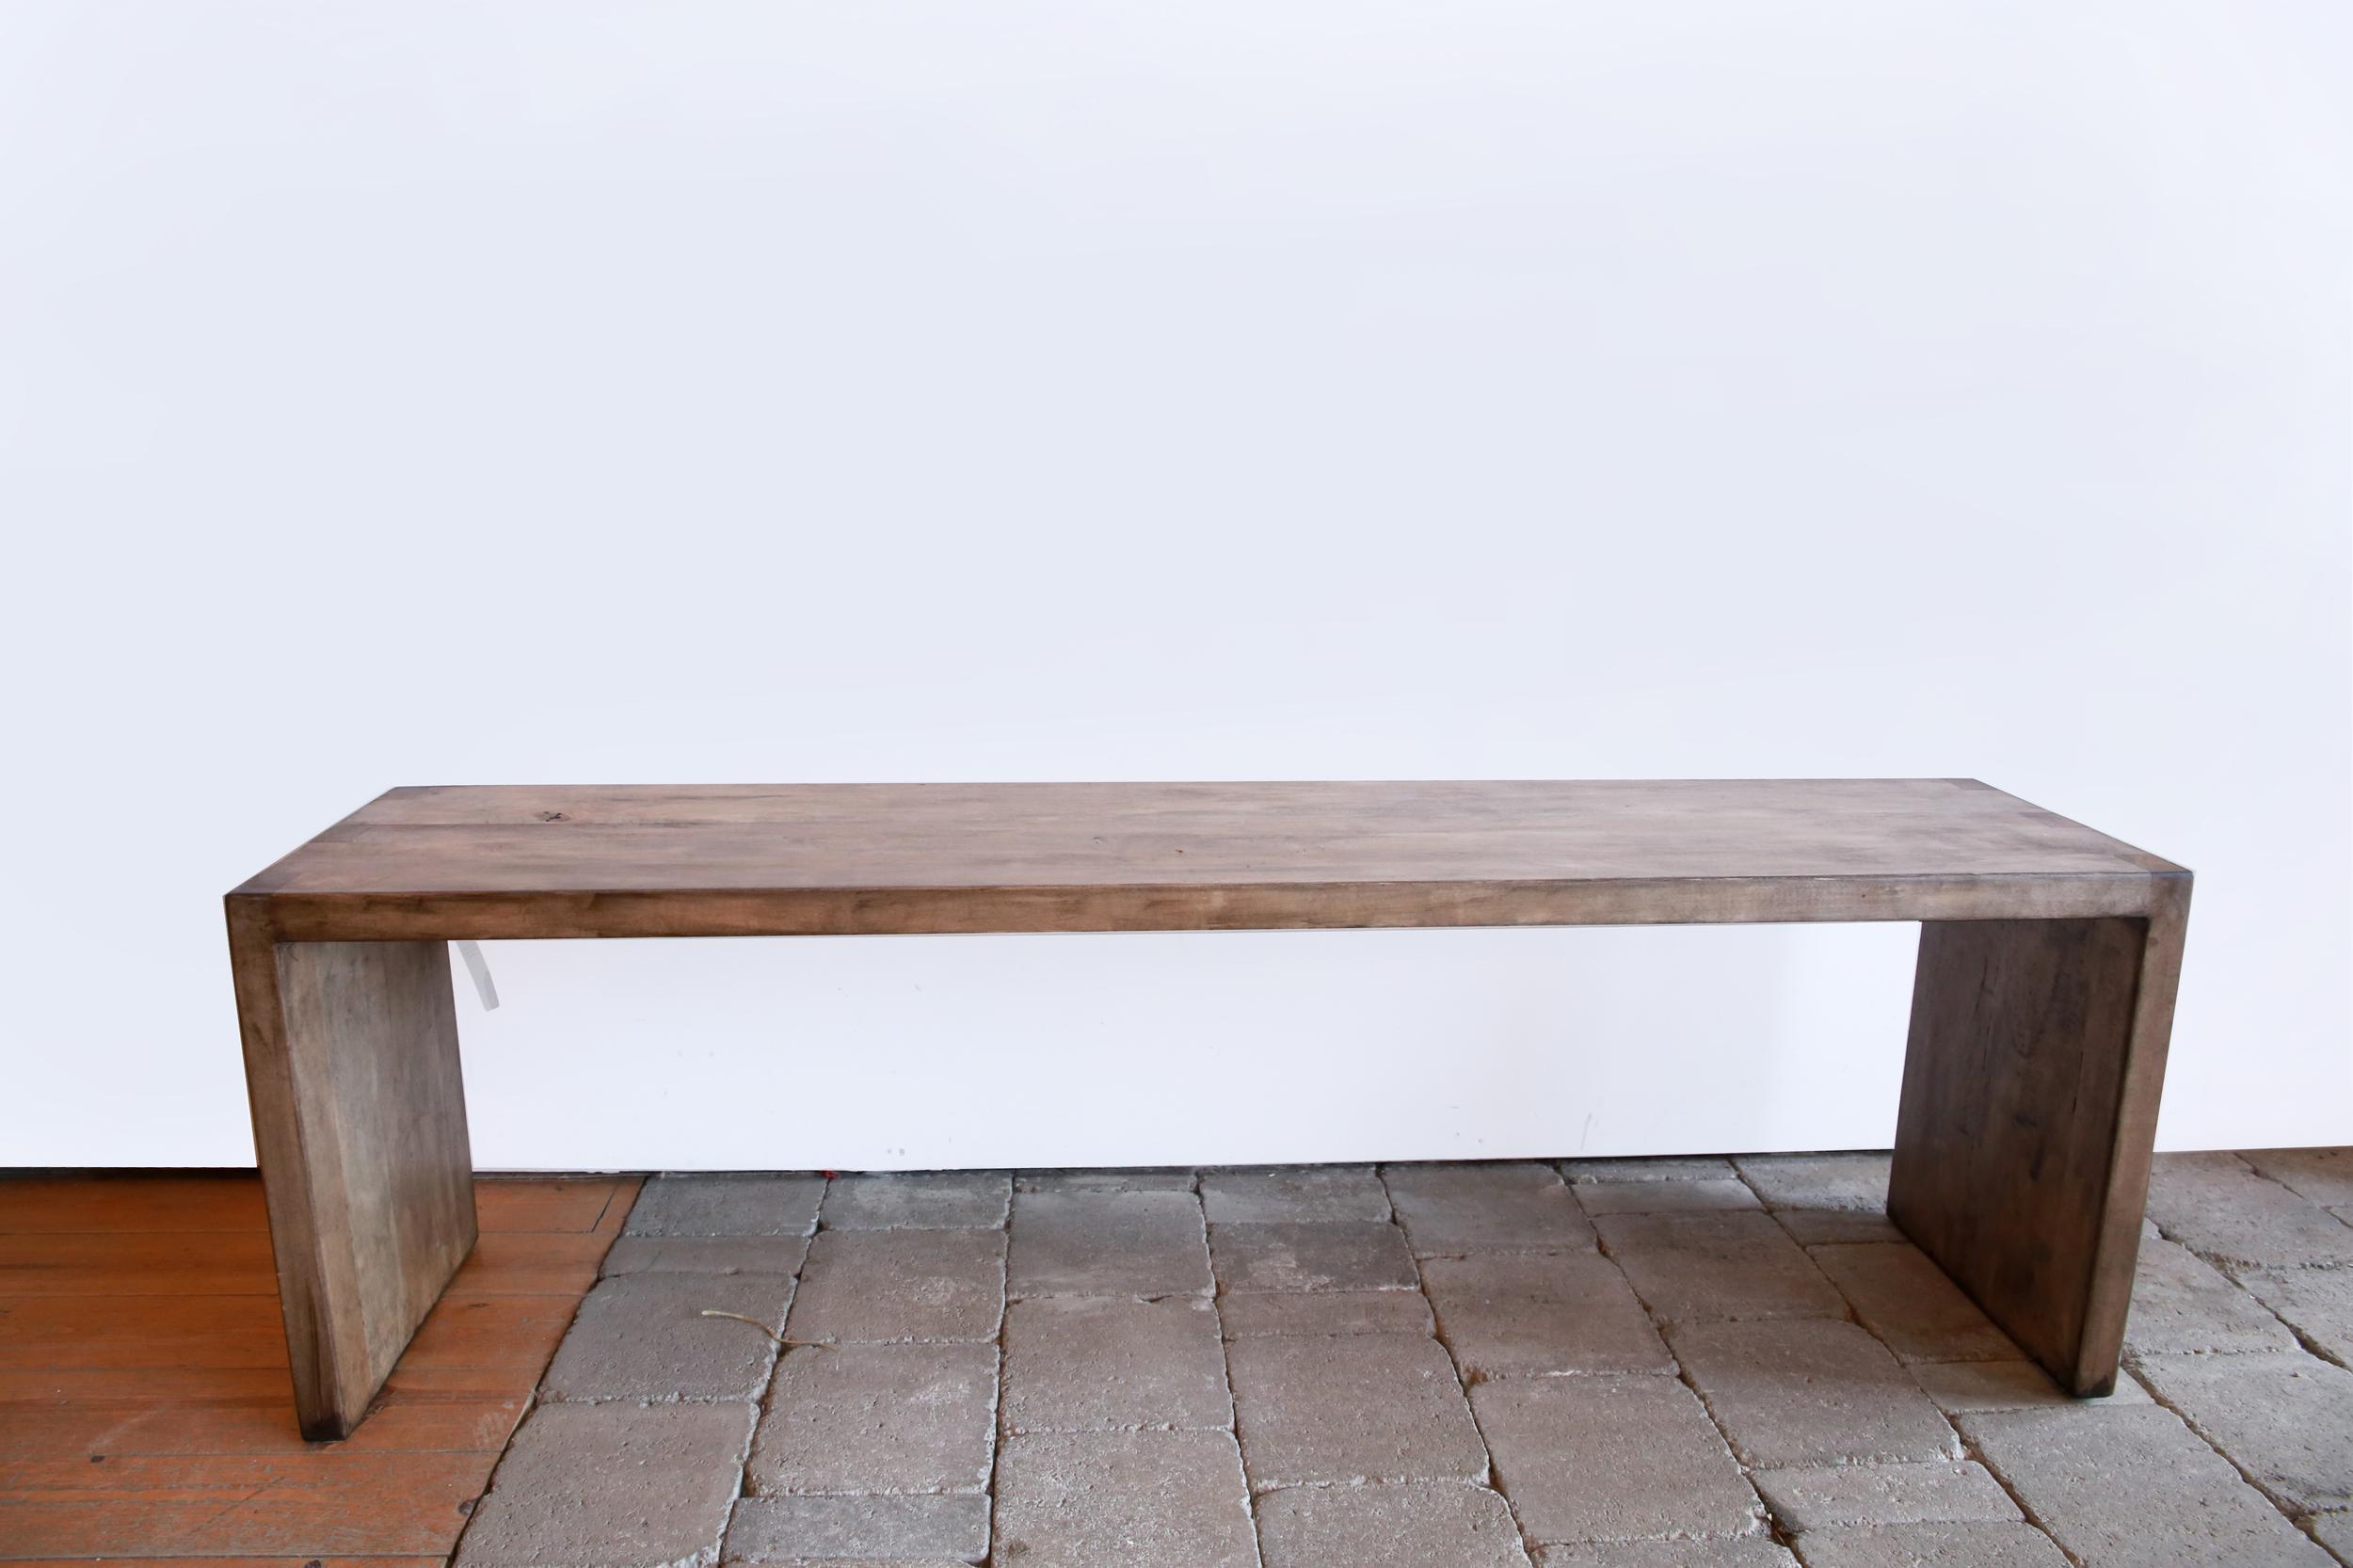 SLAB_table-4.jpg